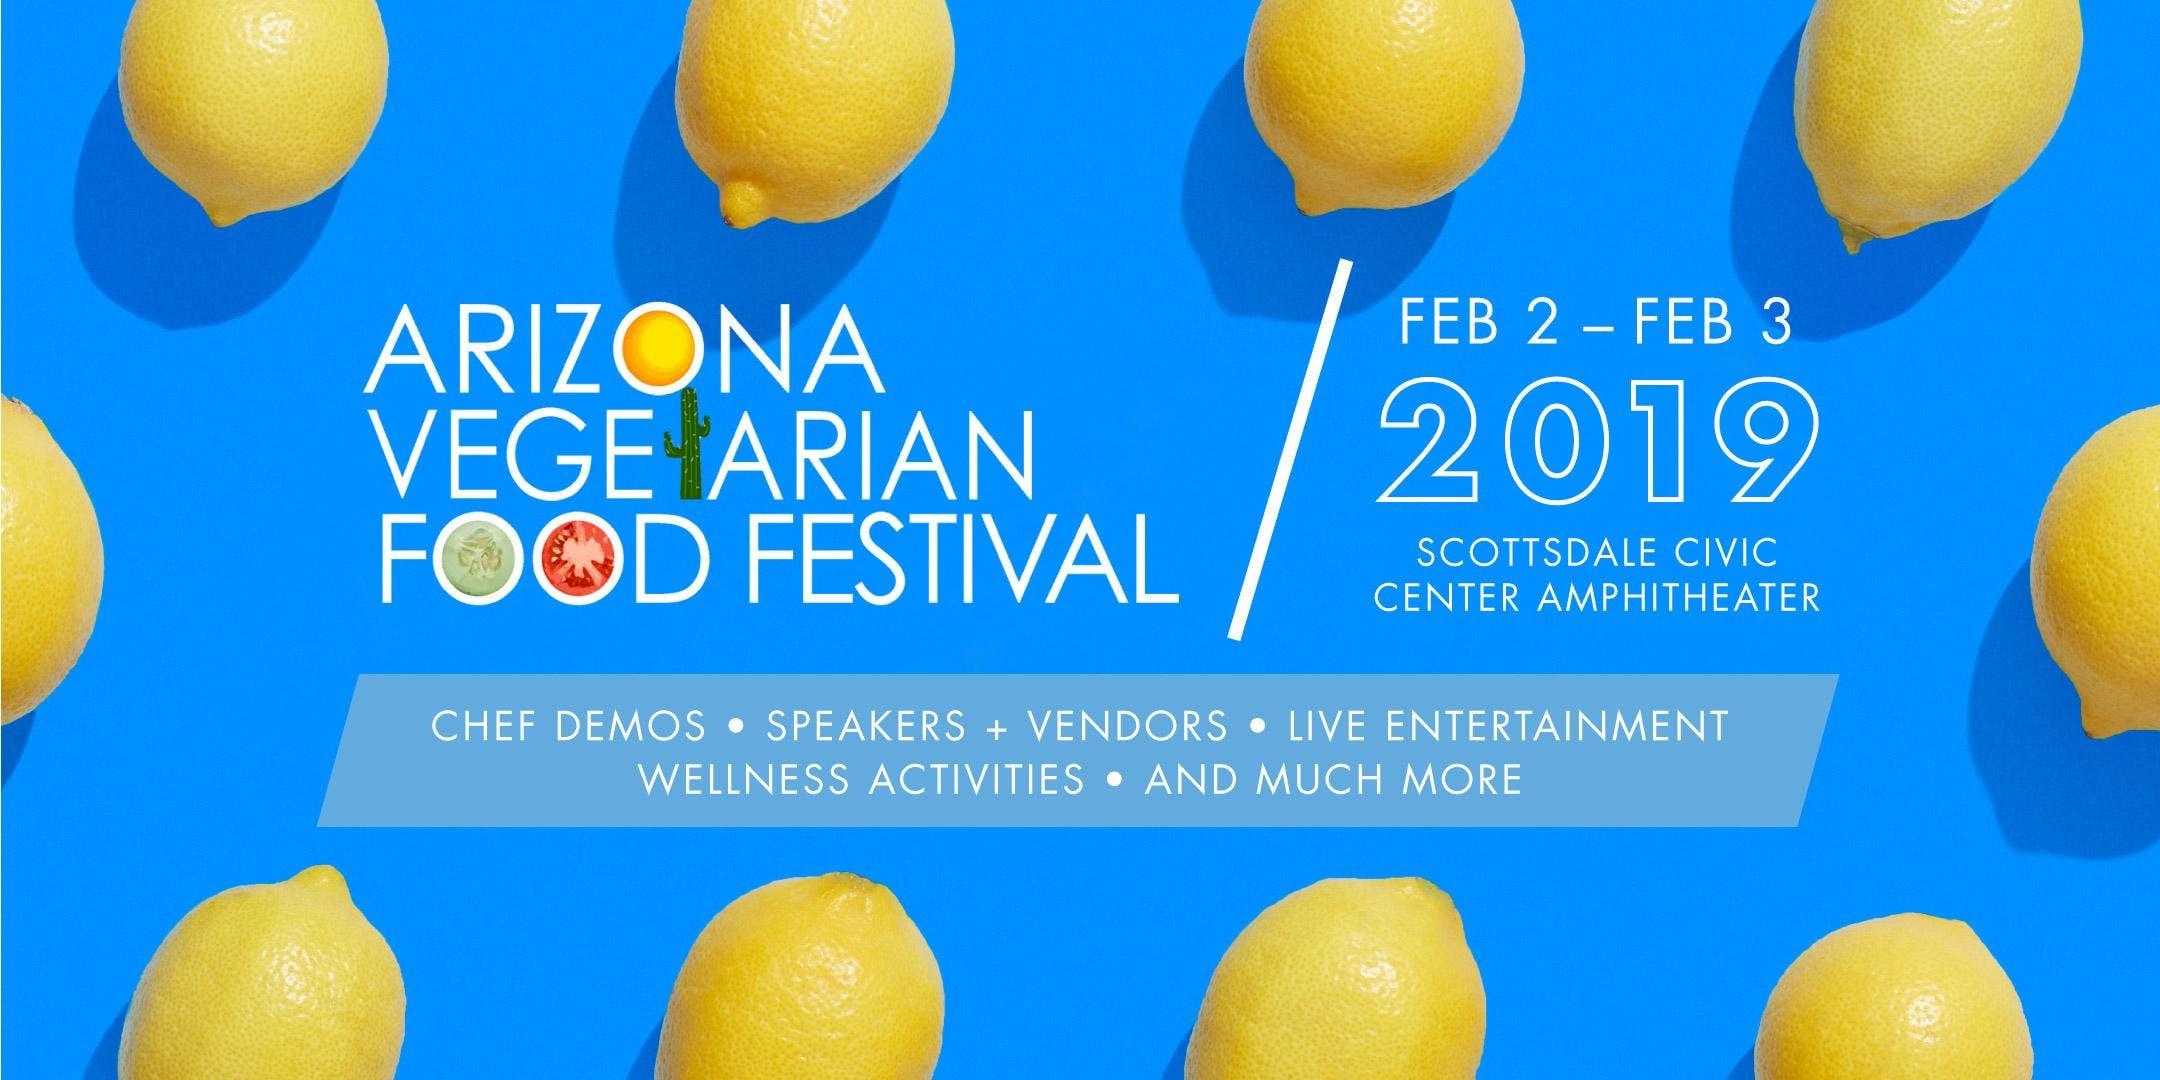 Arizona Vegetarian Food Festival 2019